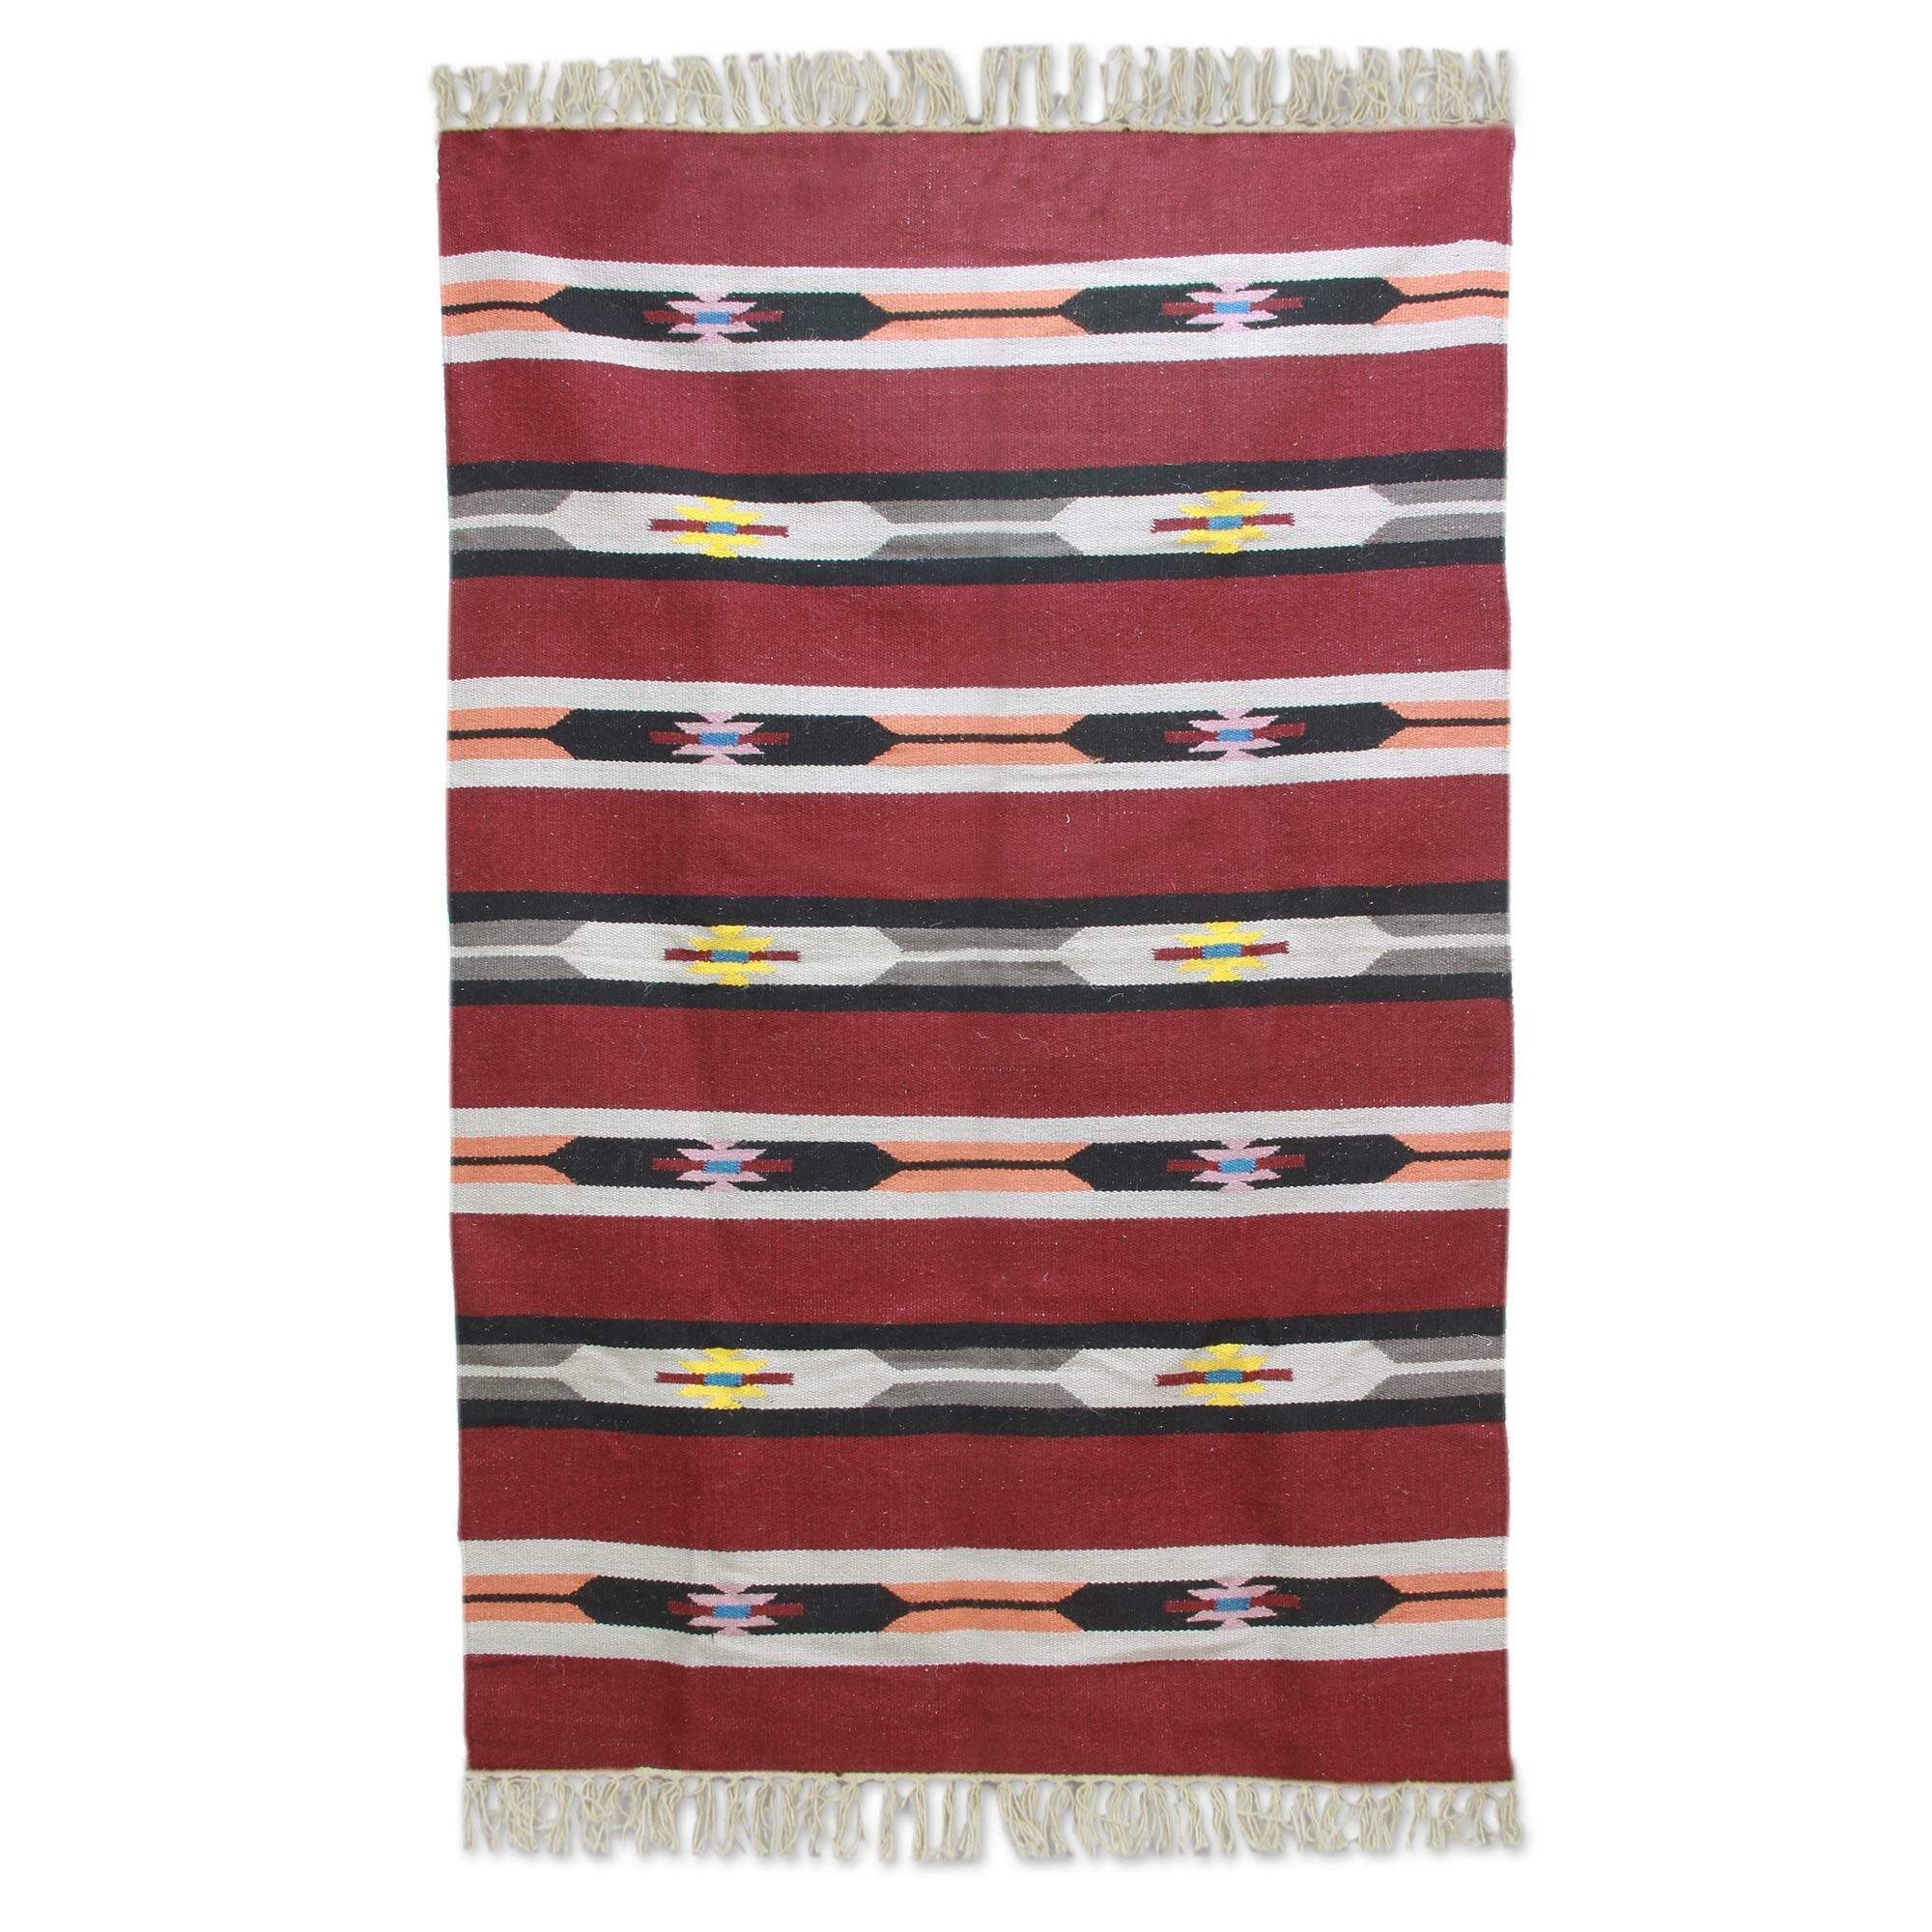 Regent's Cherry Delight Hand-Woven Wool Red Area Rug